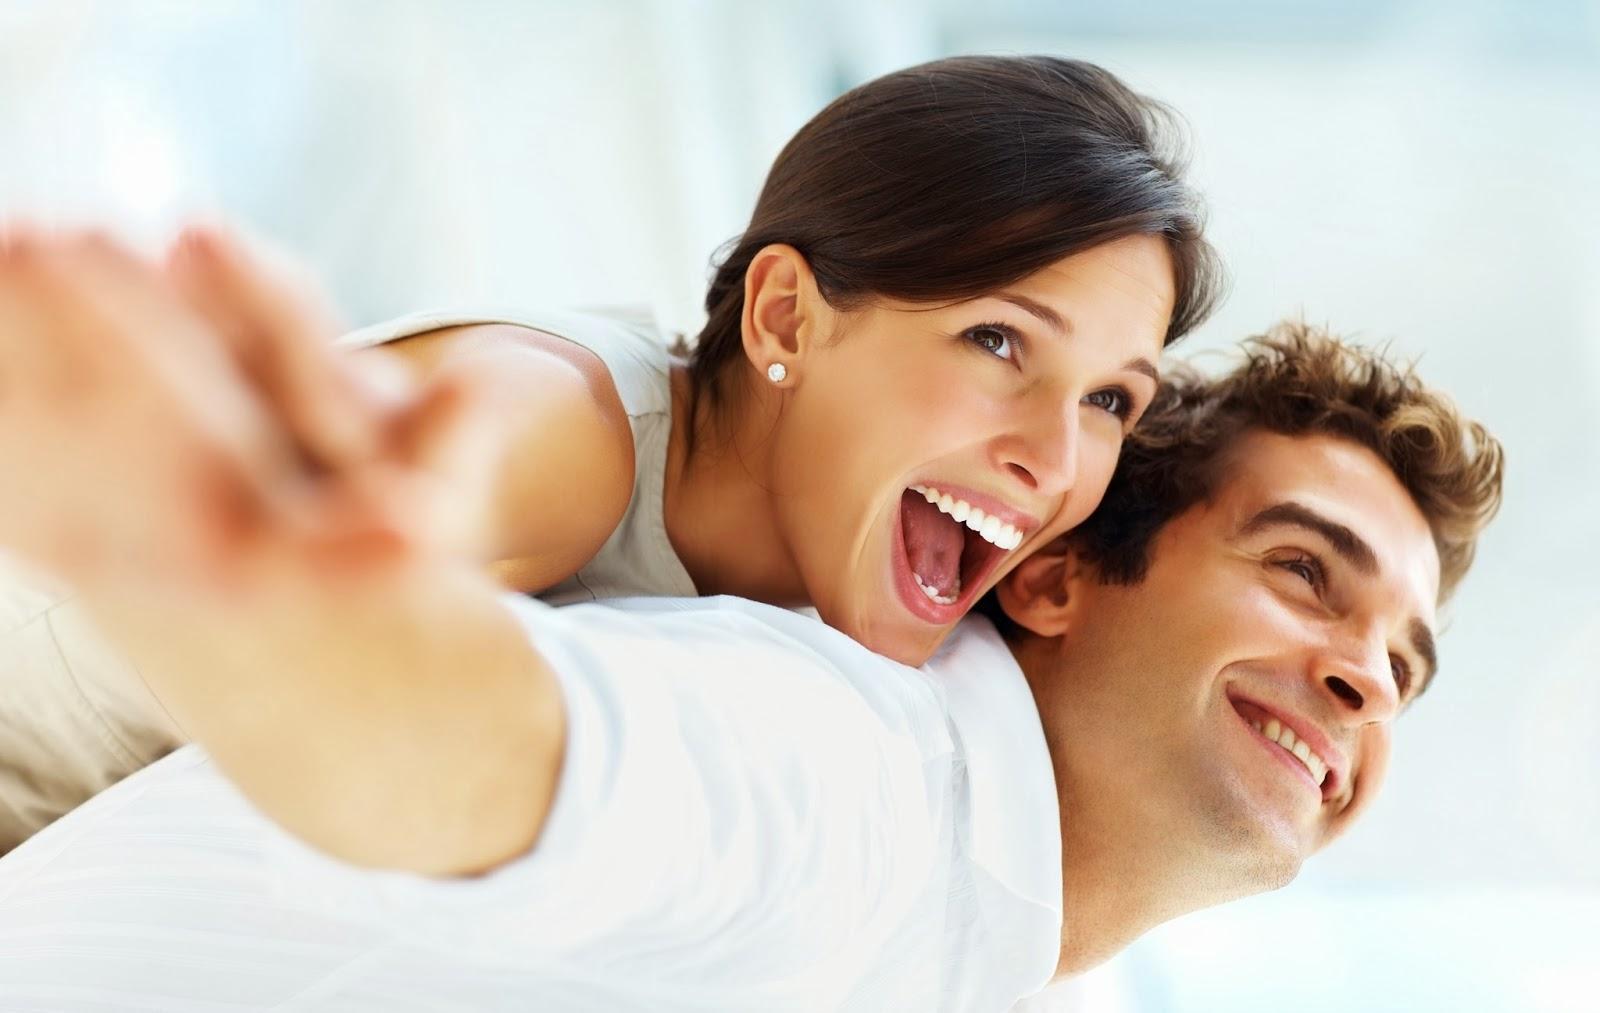 Un amor inconcluso online dating